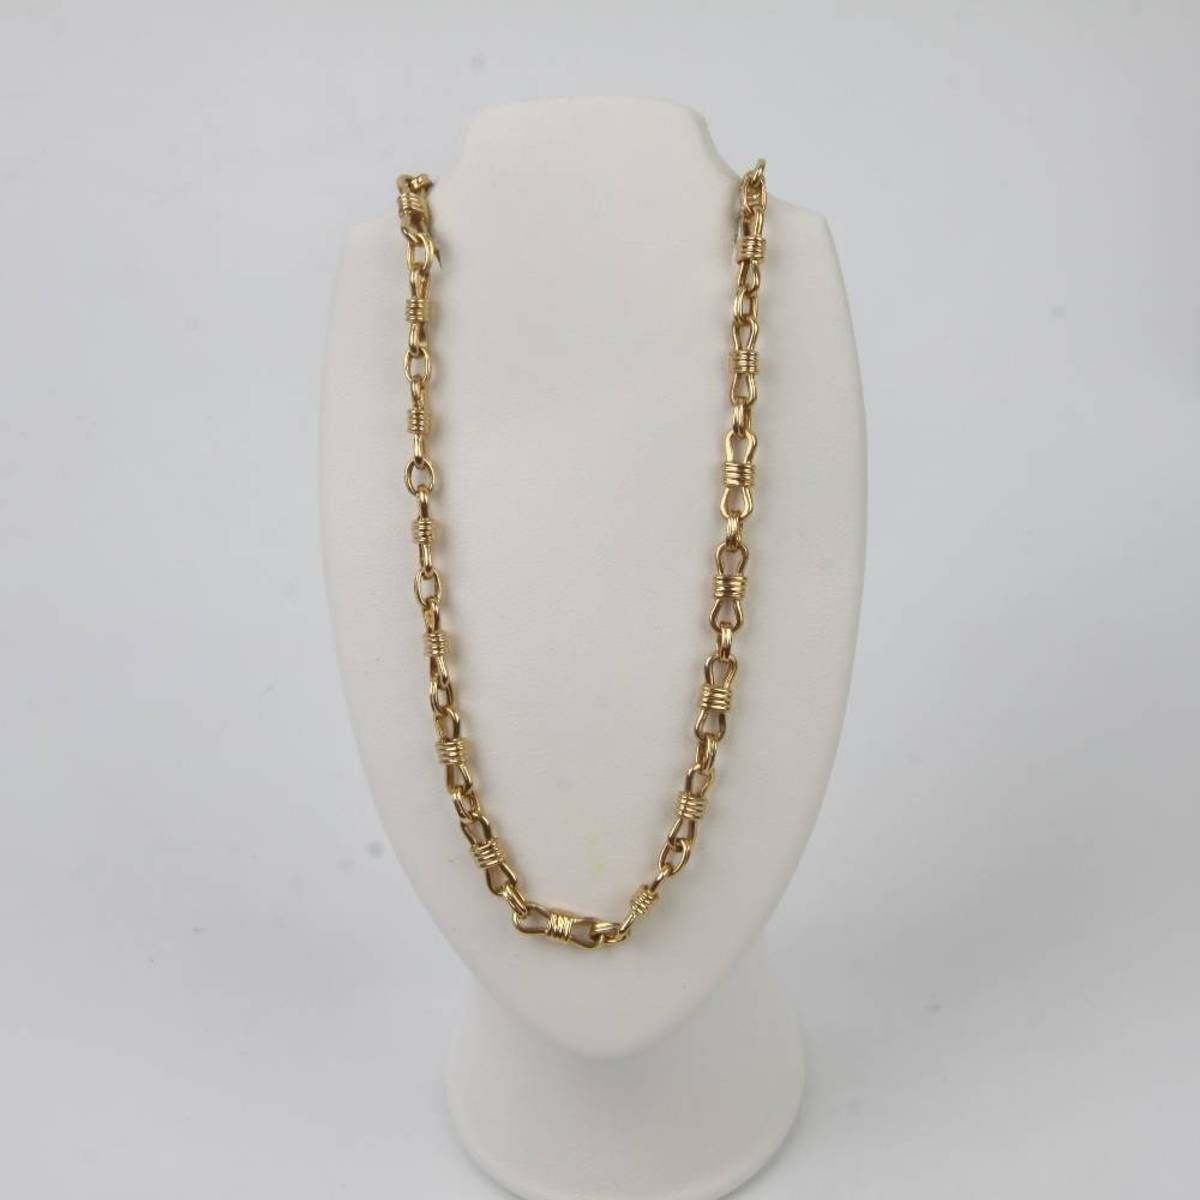 f0d436adea3f Cadena de oro macizo cadena de segunda mano oro